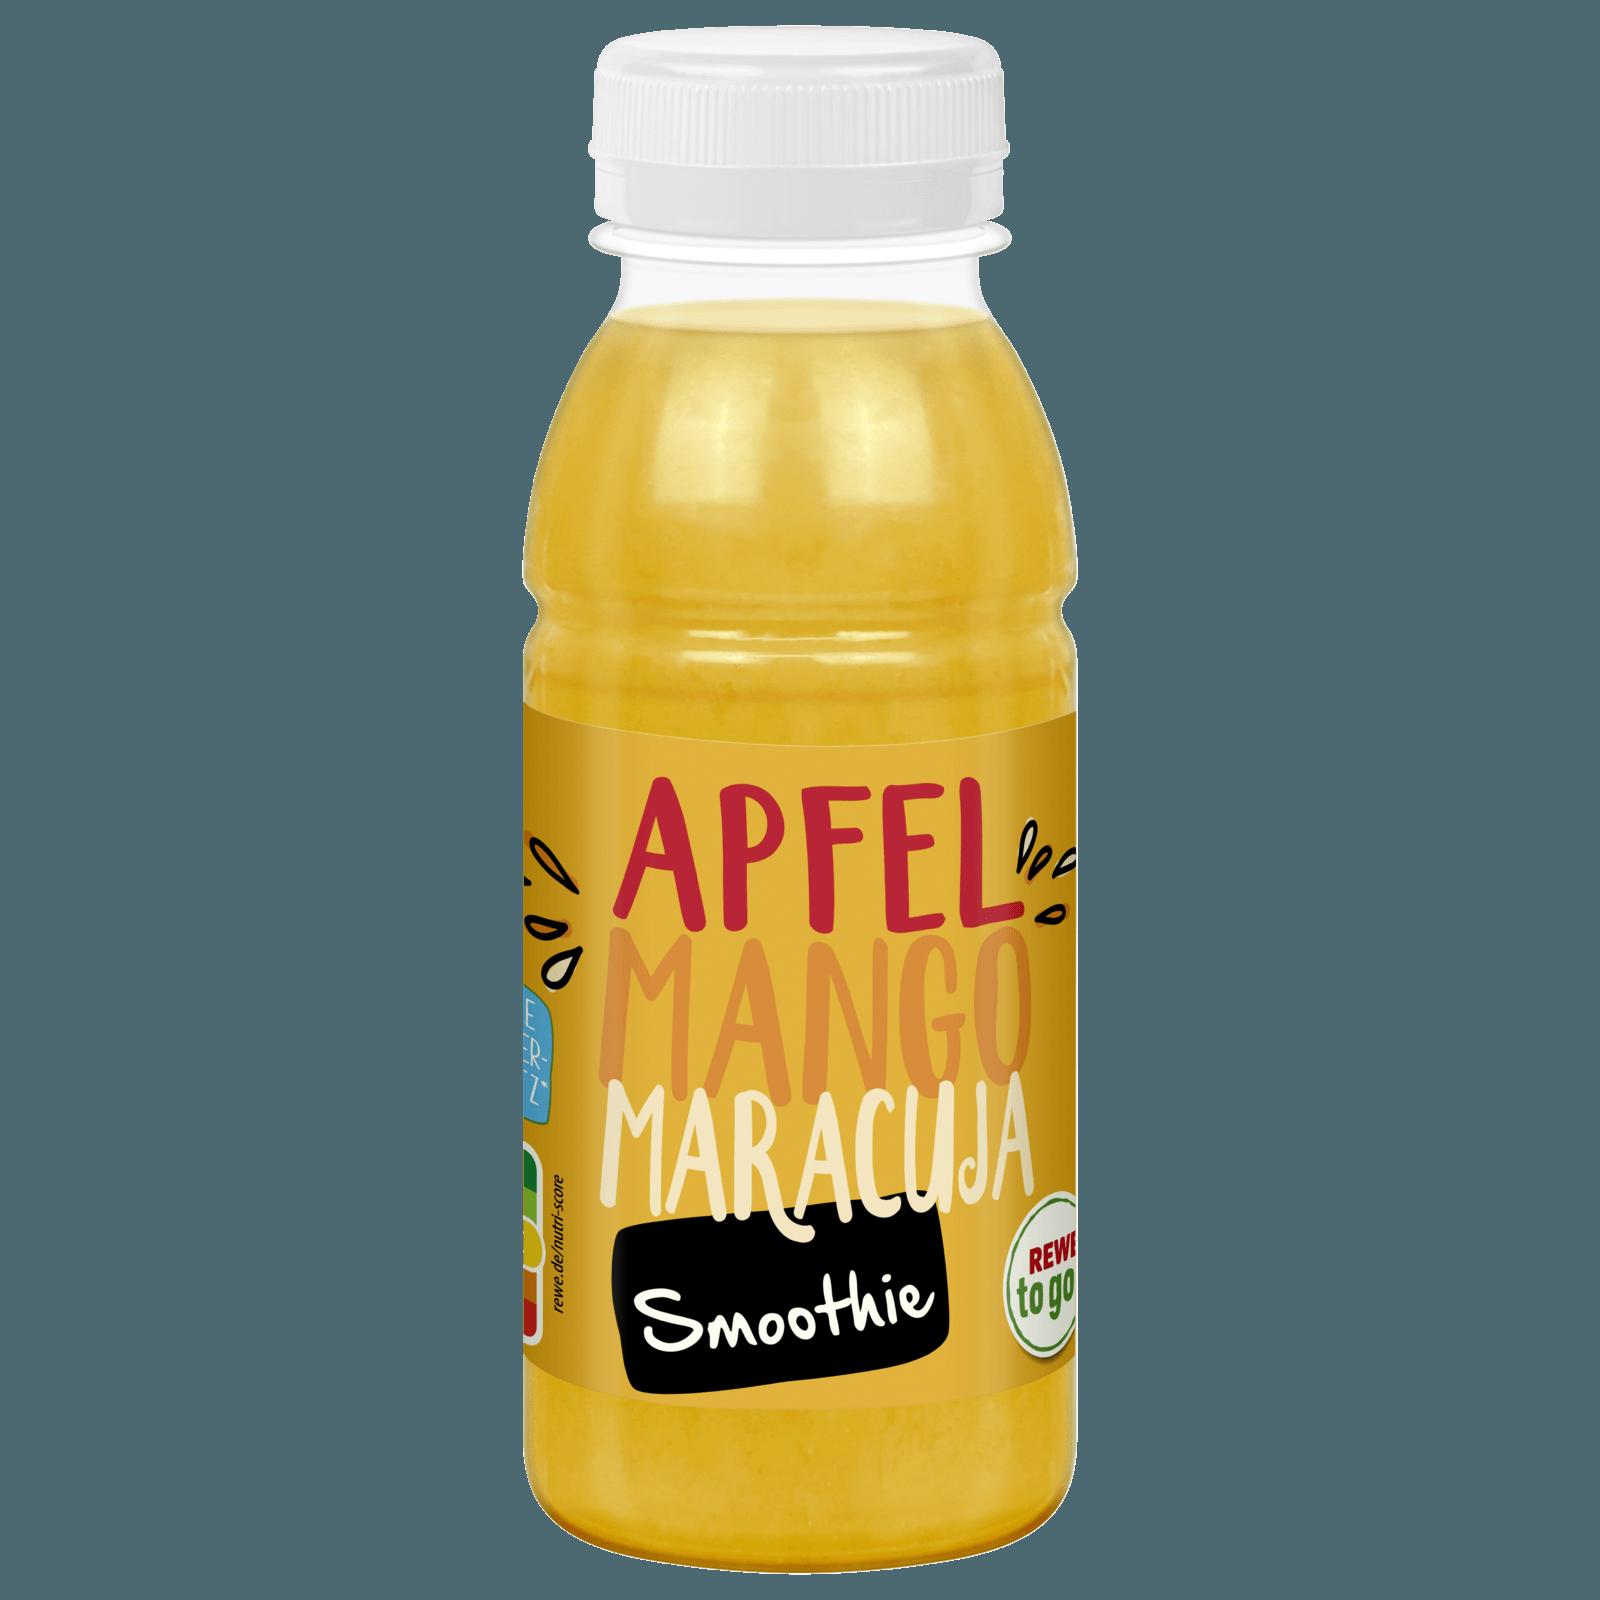 REWE to go Apfel-Mango-Maracuja Smoothie 250ml